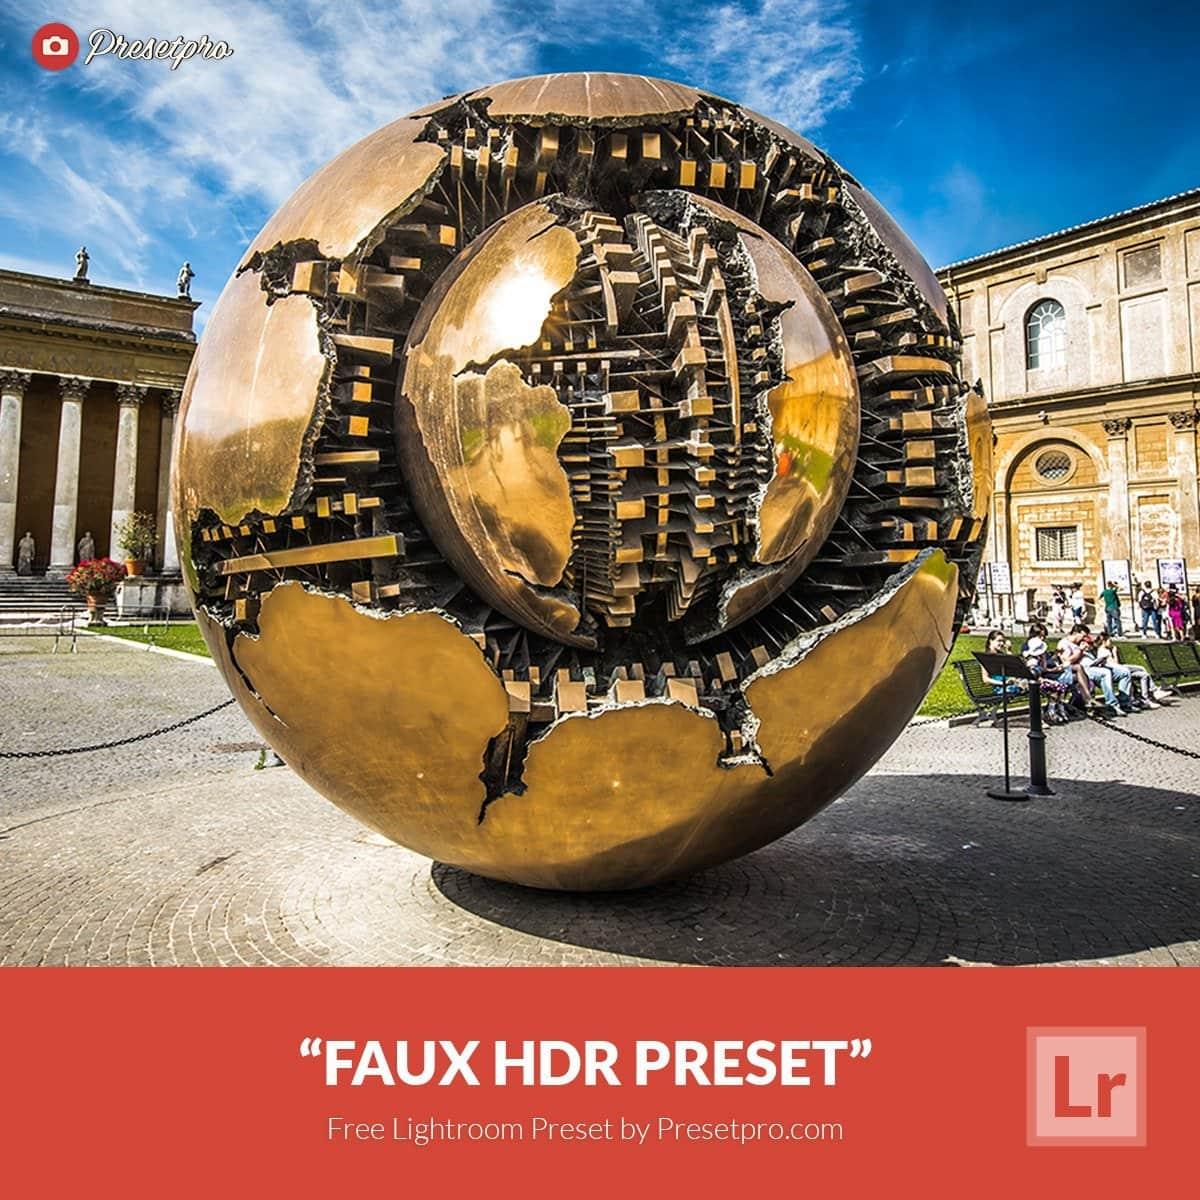 Free-Lightroom-Preset-Faux-HDR-Presetpro.com